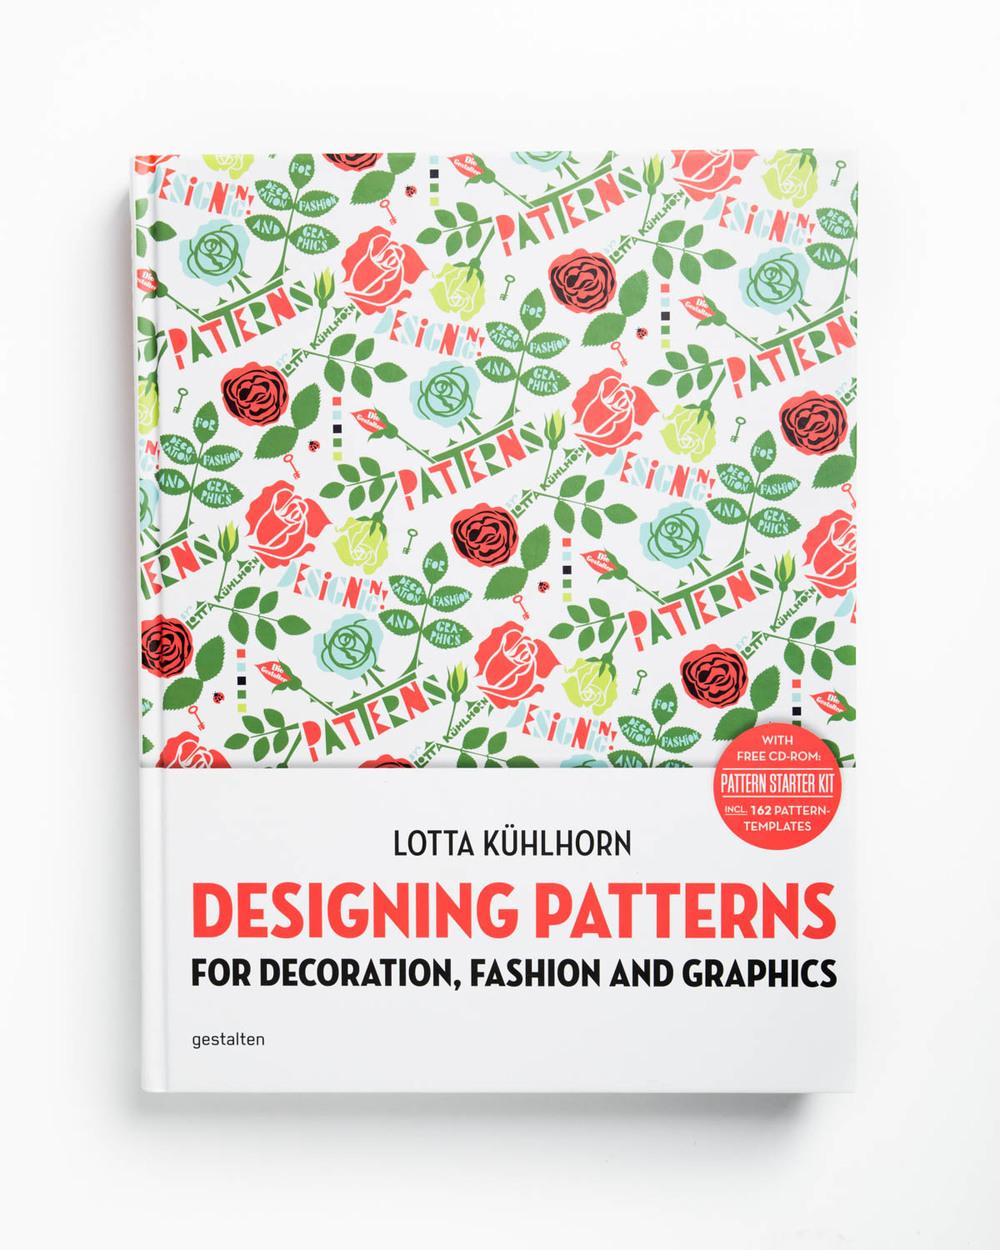 DesigningPatterns1.jpg